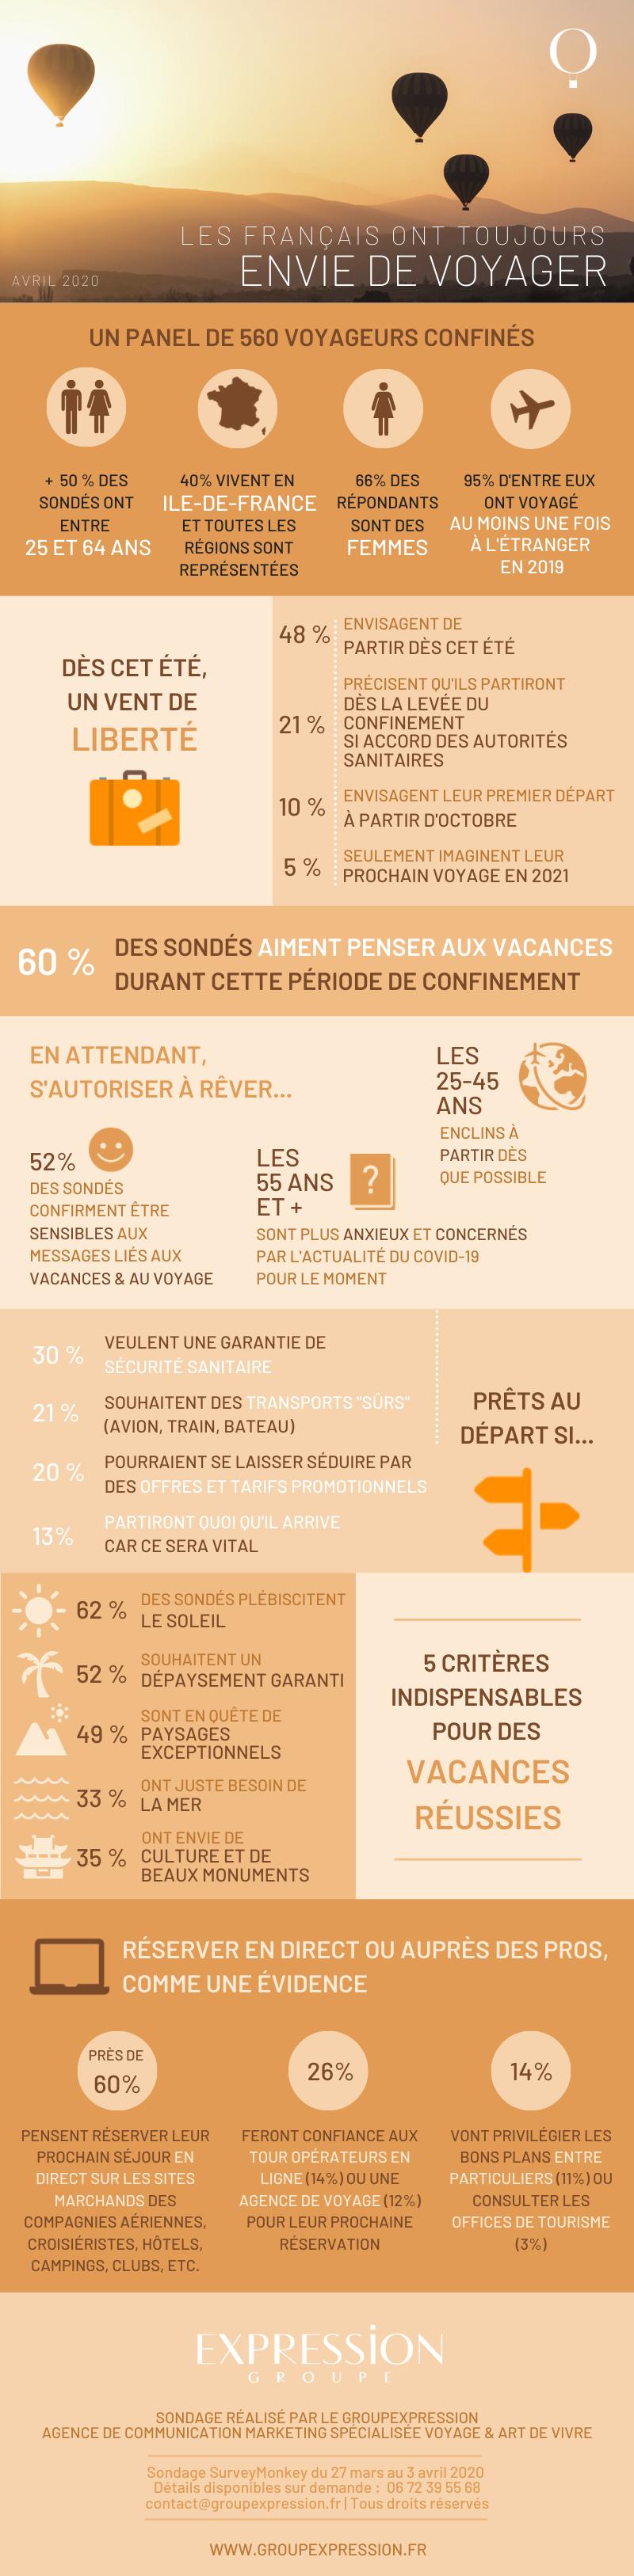 https://www.tendancehotellerie.fr/IMG/png/8678.png